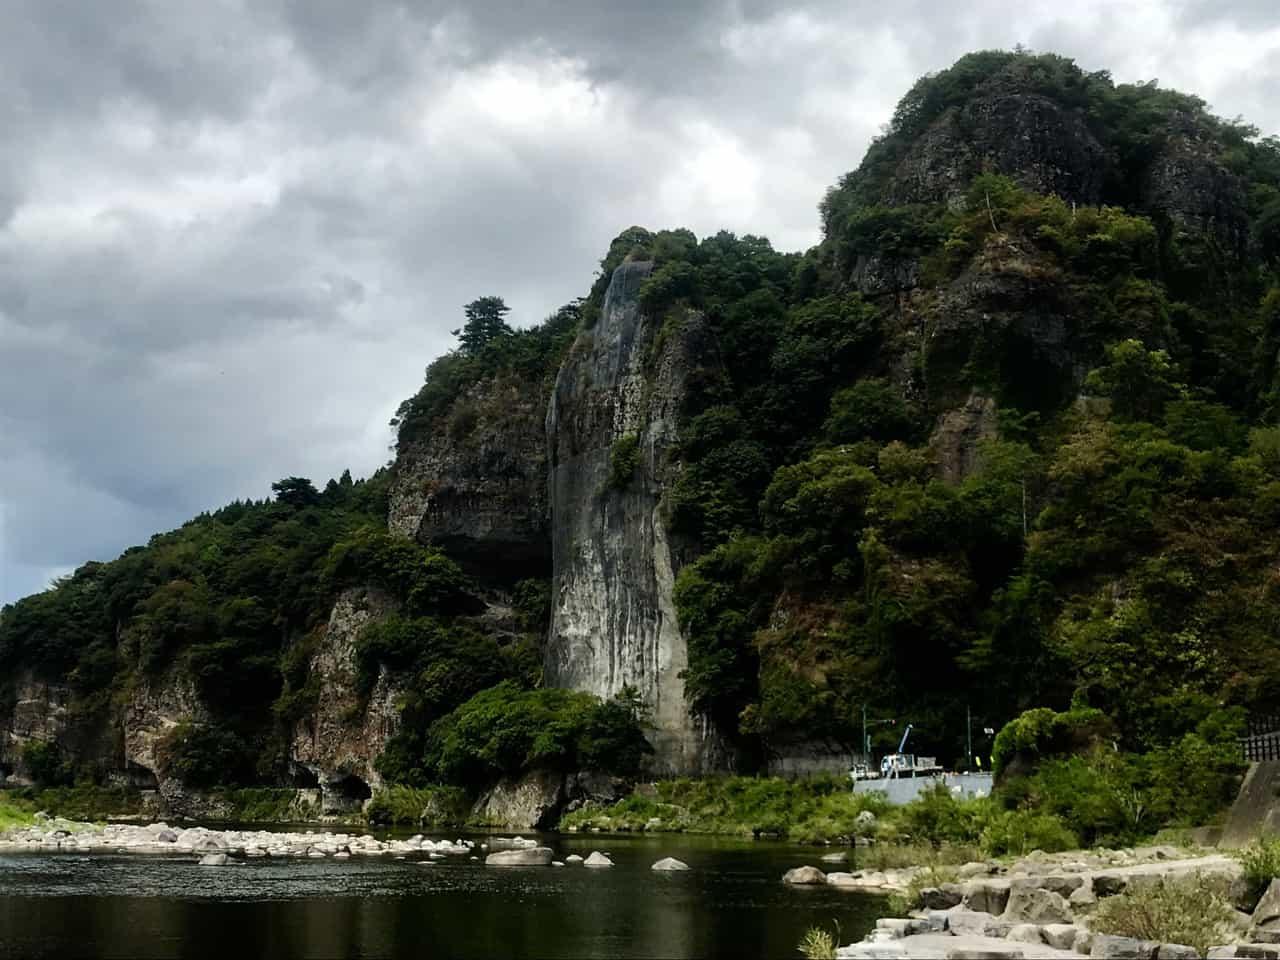 Discover Japan's famous scenic spot, Yabakei Gorge in Nakatsu